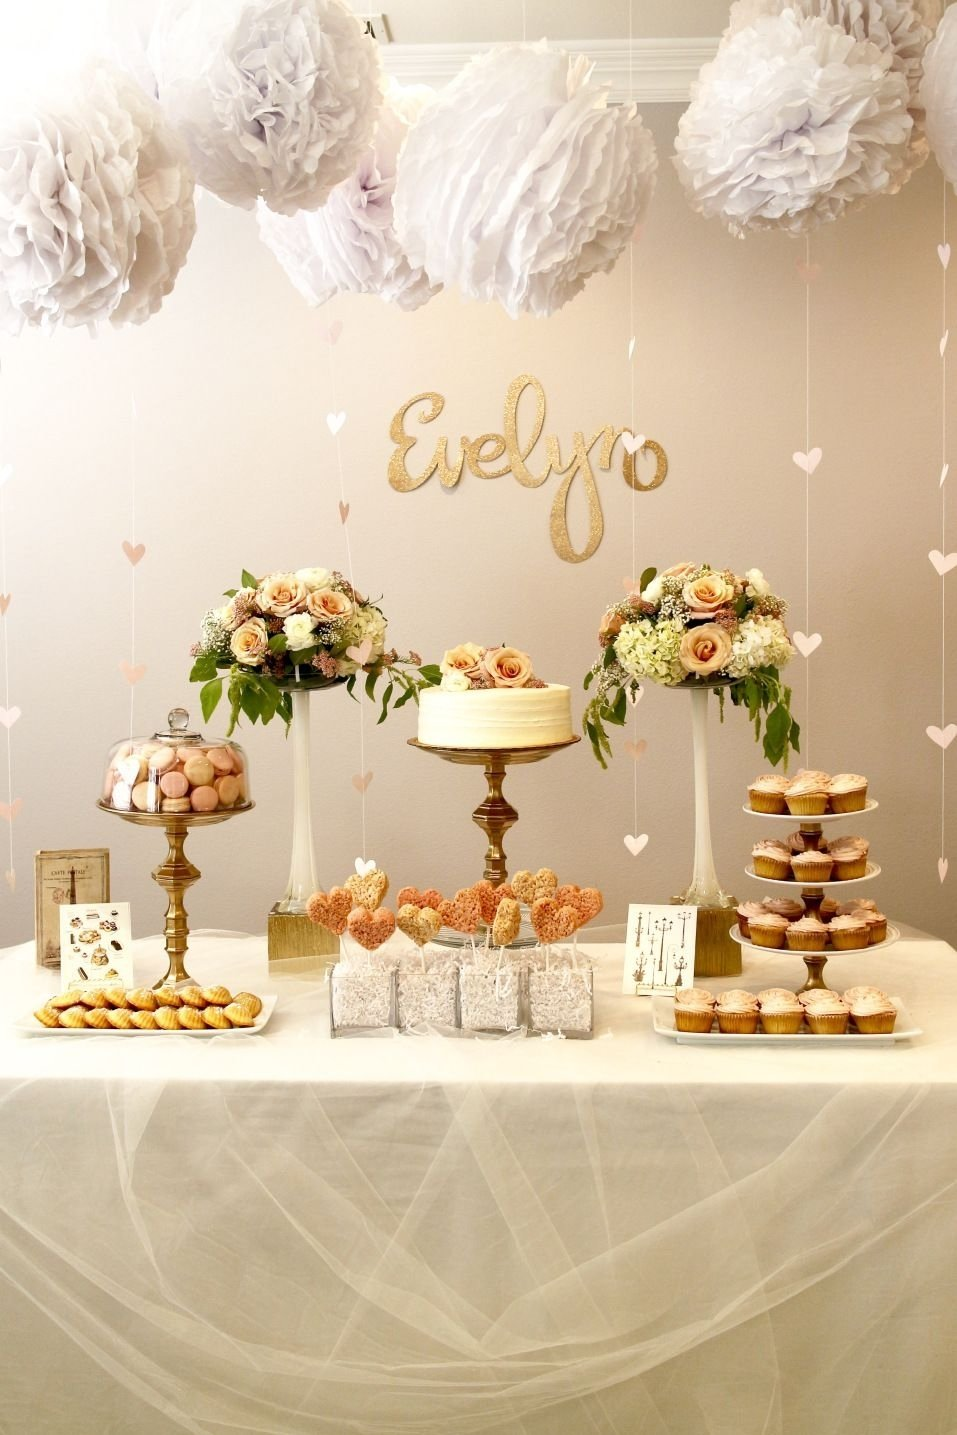 10 Unique Golden Birthday Party Ideas For Adults bon anniversaire blush pink feminine and romantic 2021